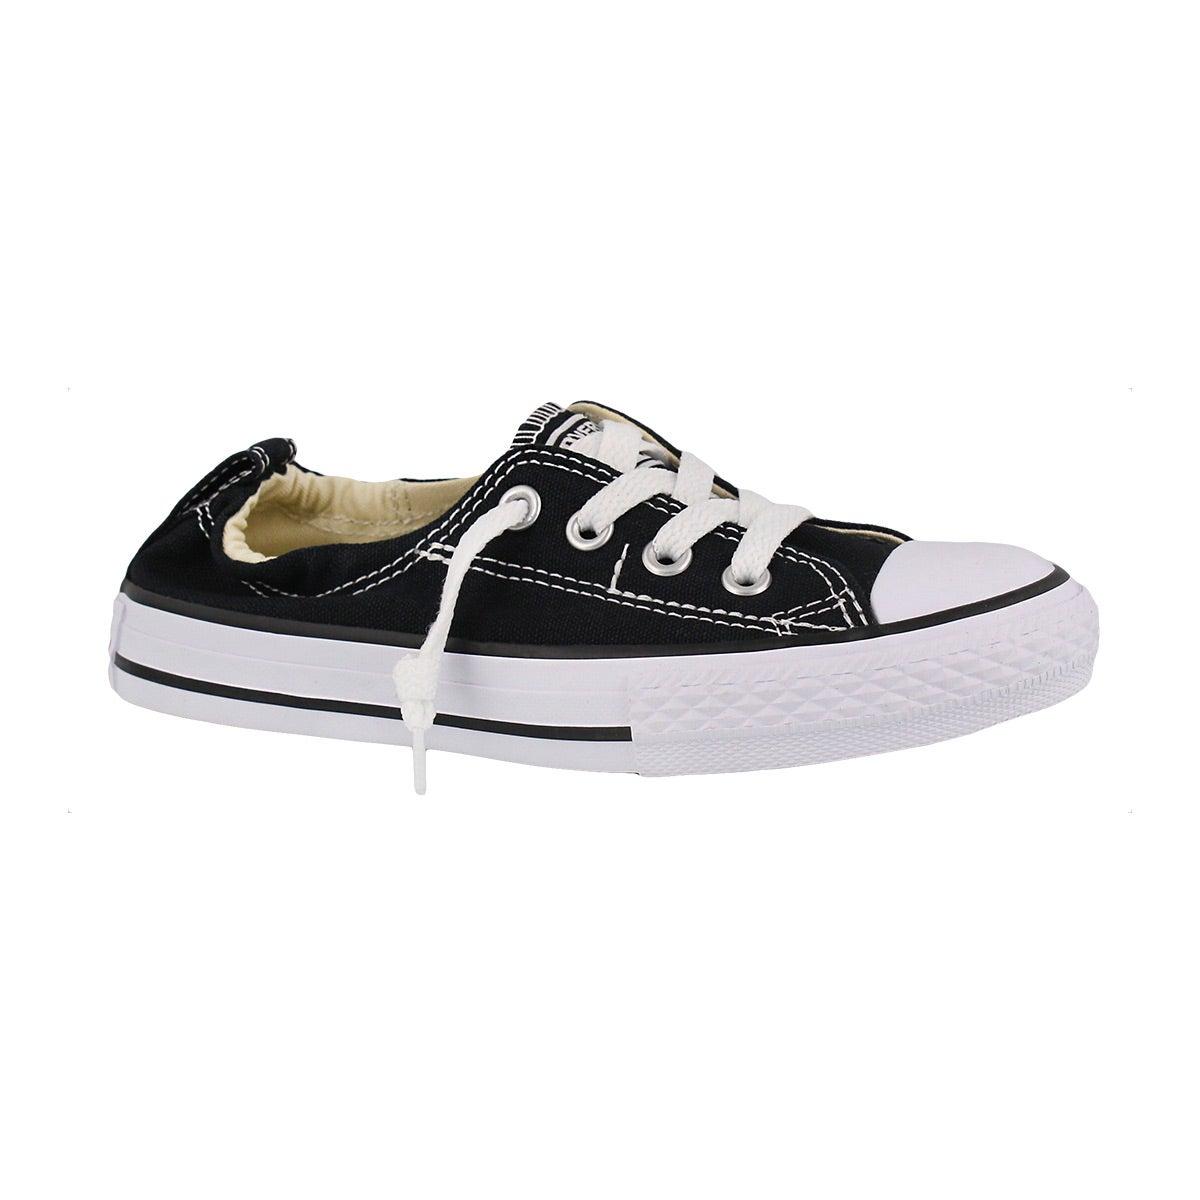 Girls' CT  ALL STAR SHORELINE black sneakers